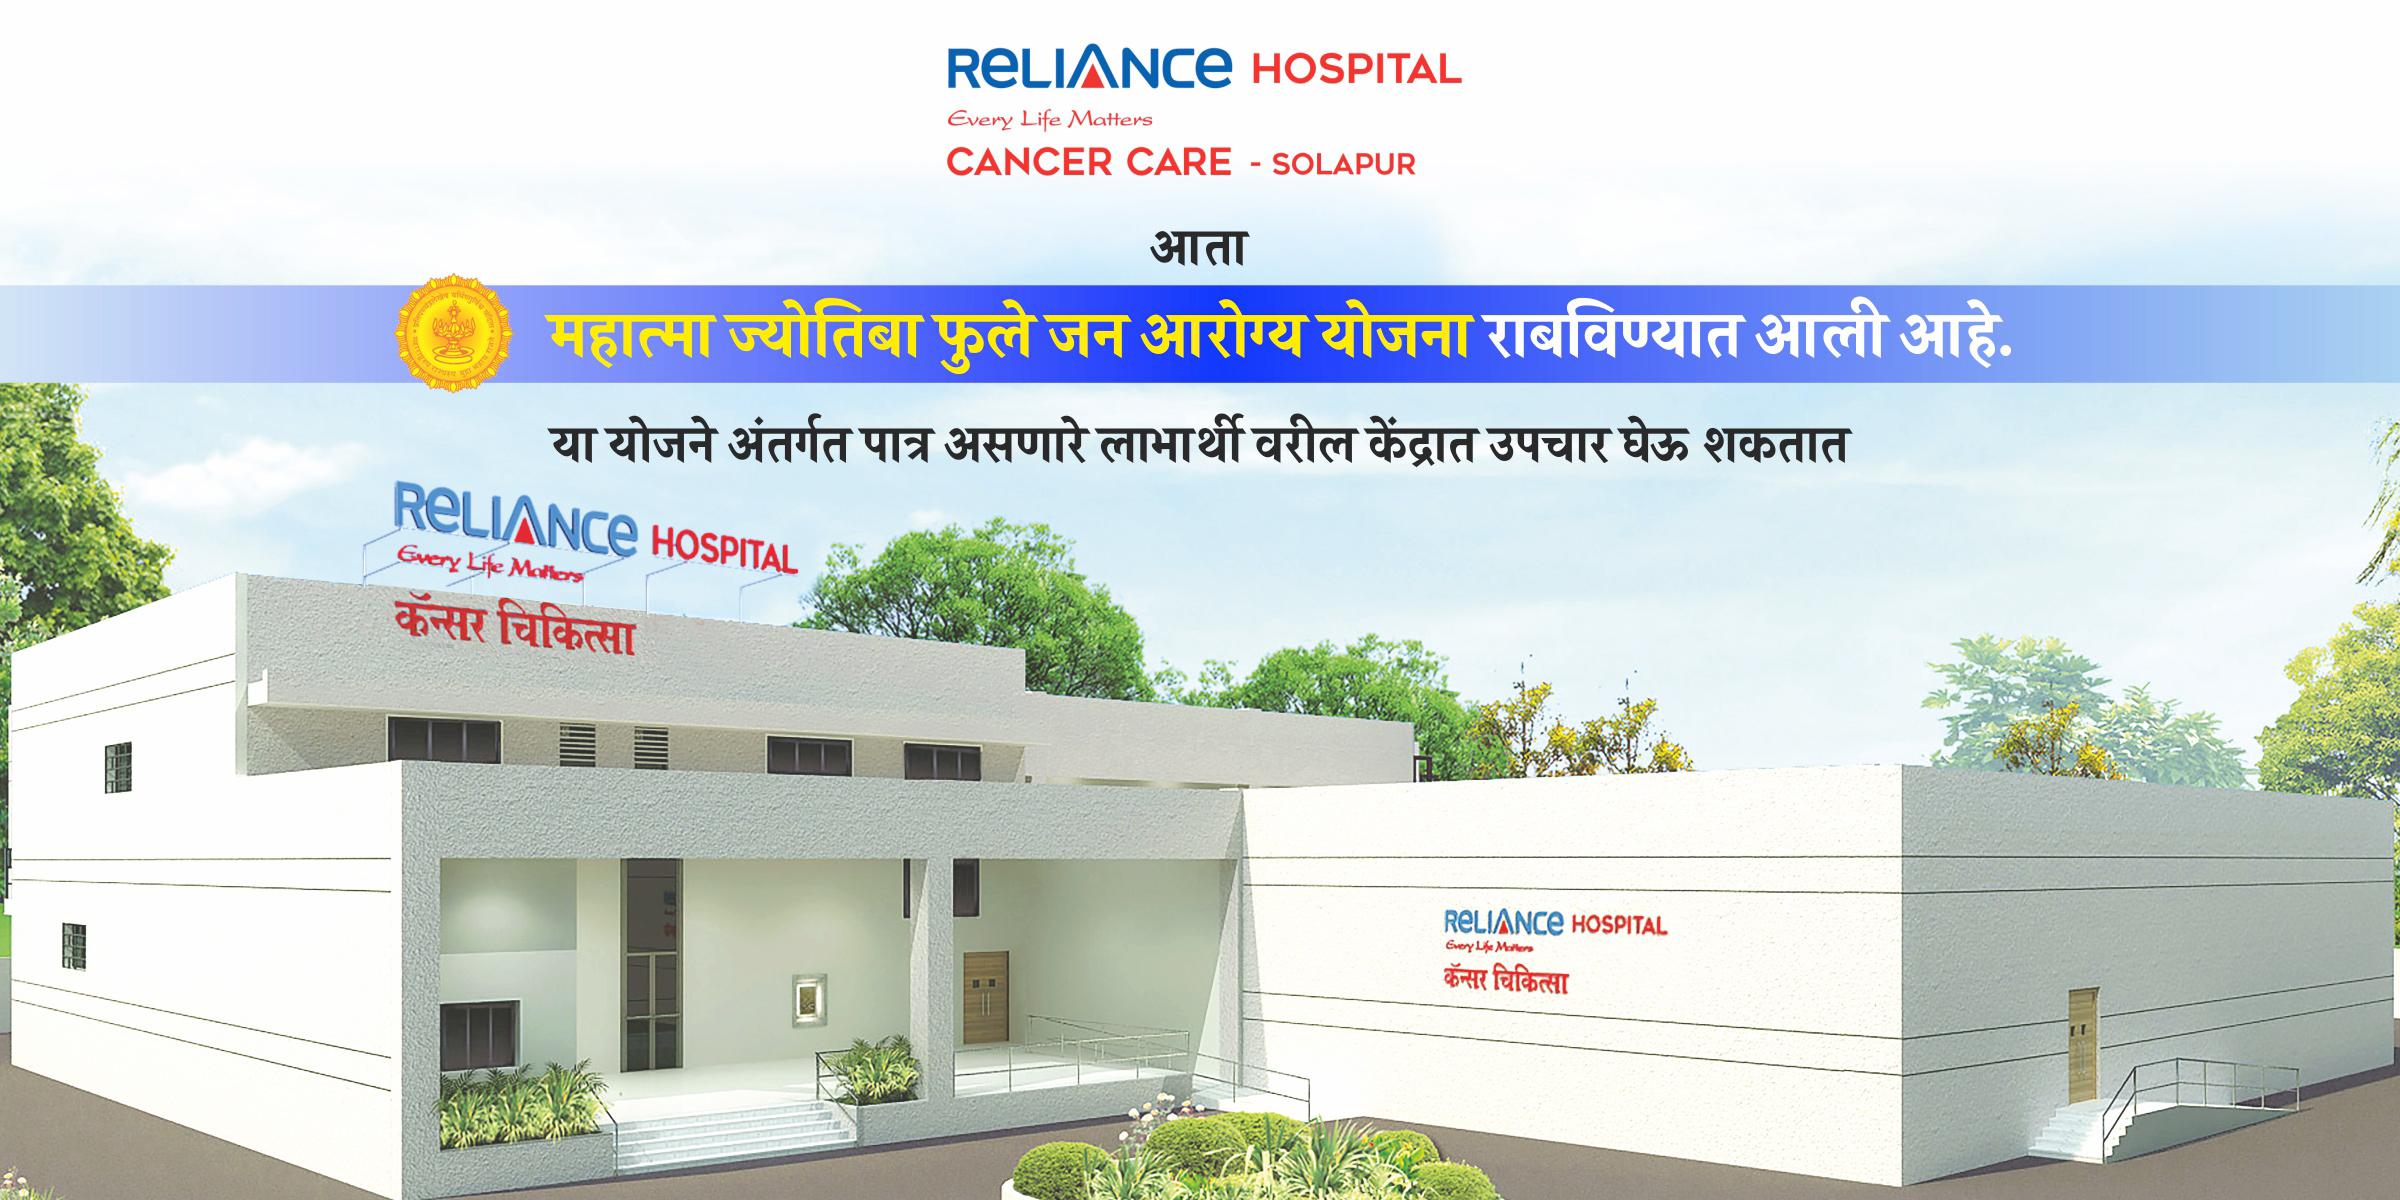 Cancer Centre in Solapur - Mahatma Jyotiba Phule Scheme